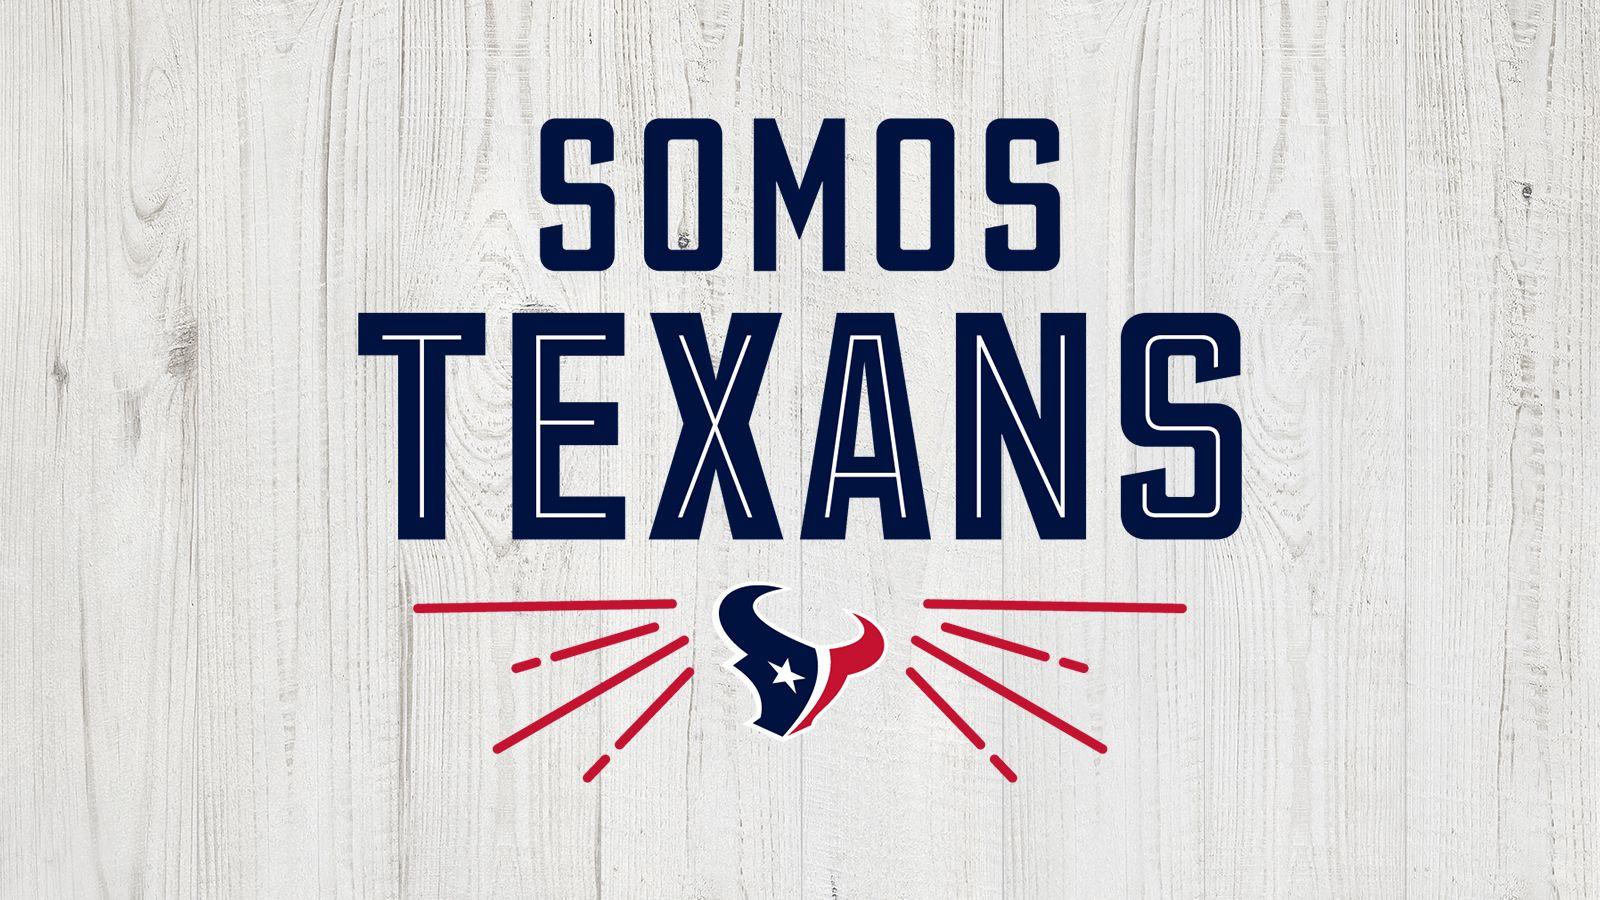 Somos Texans